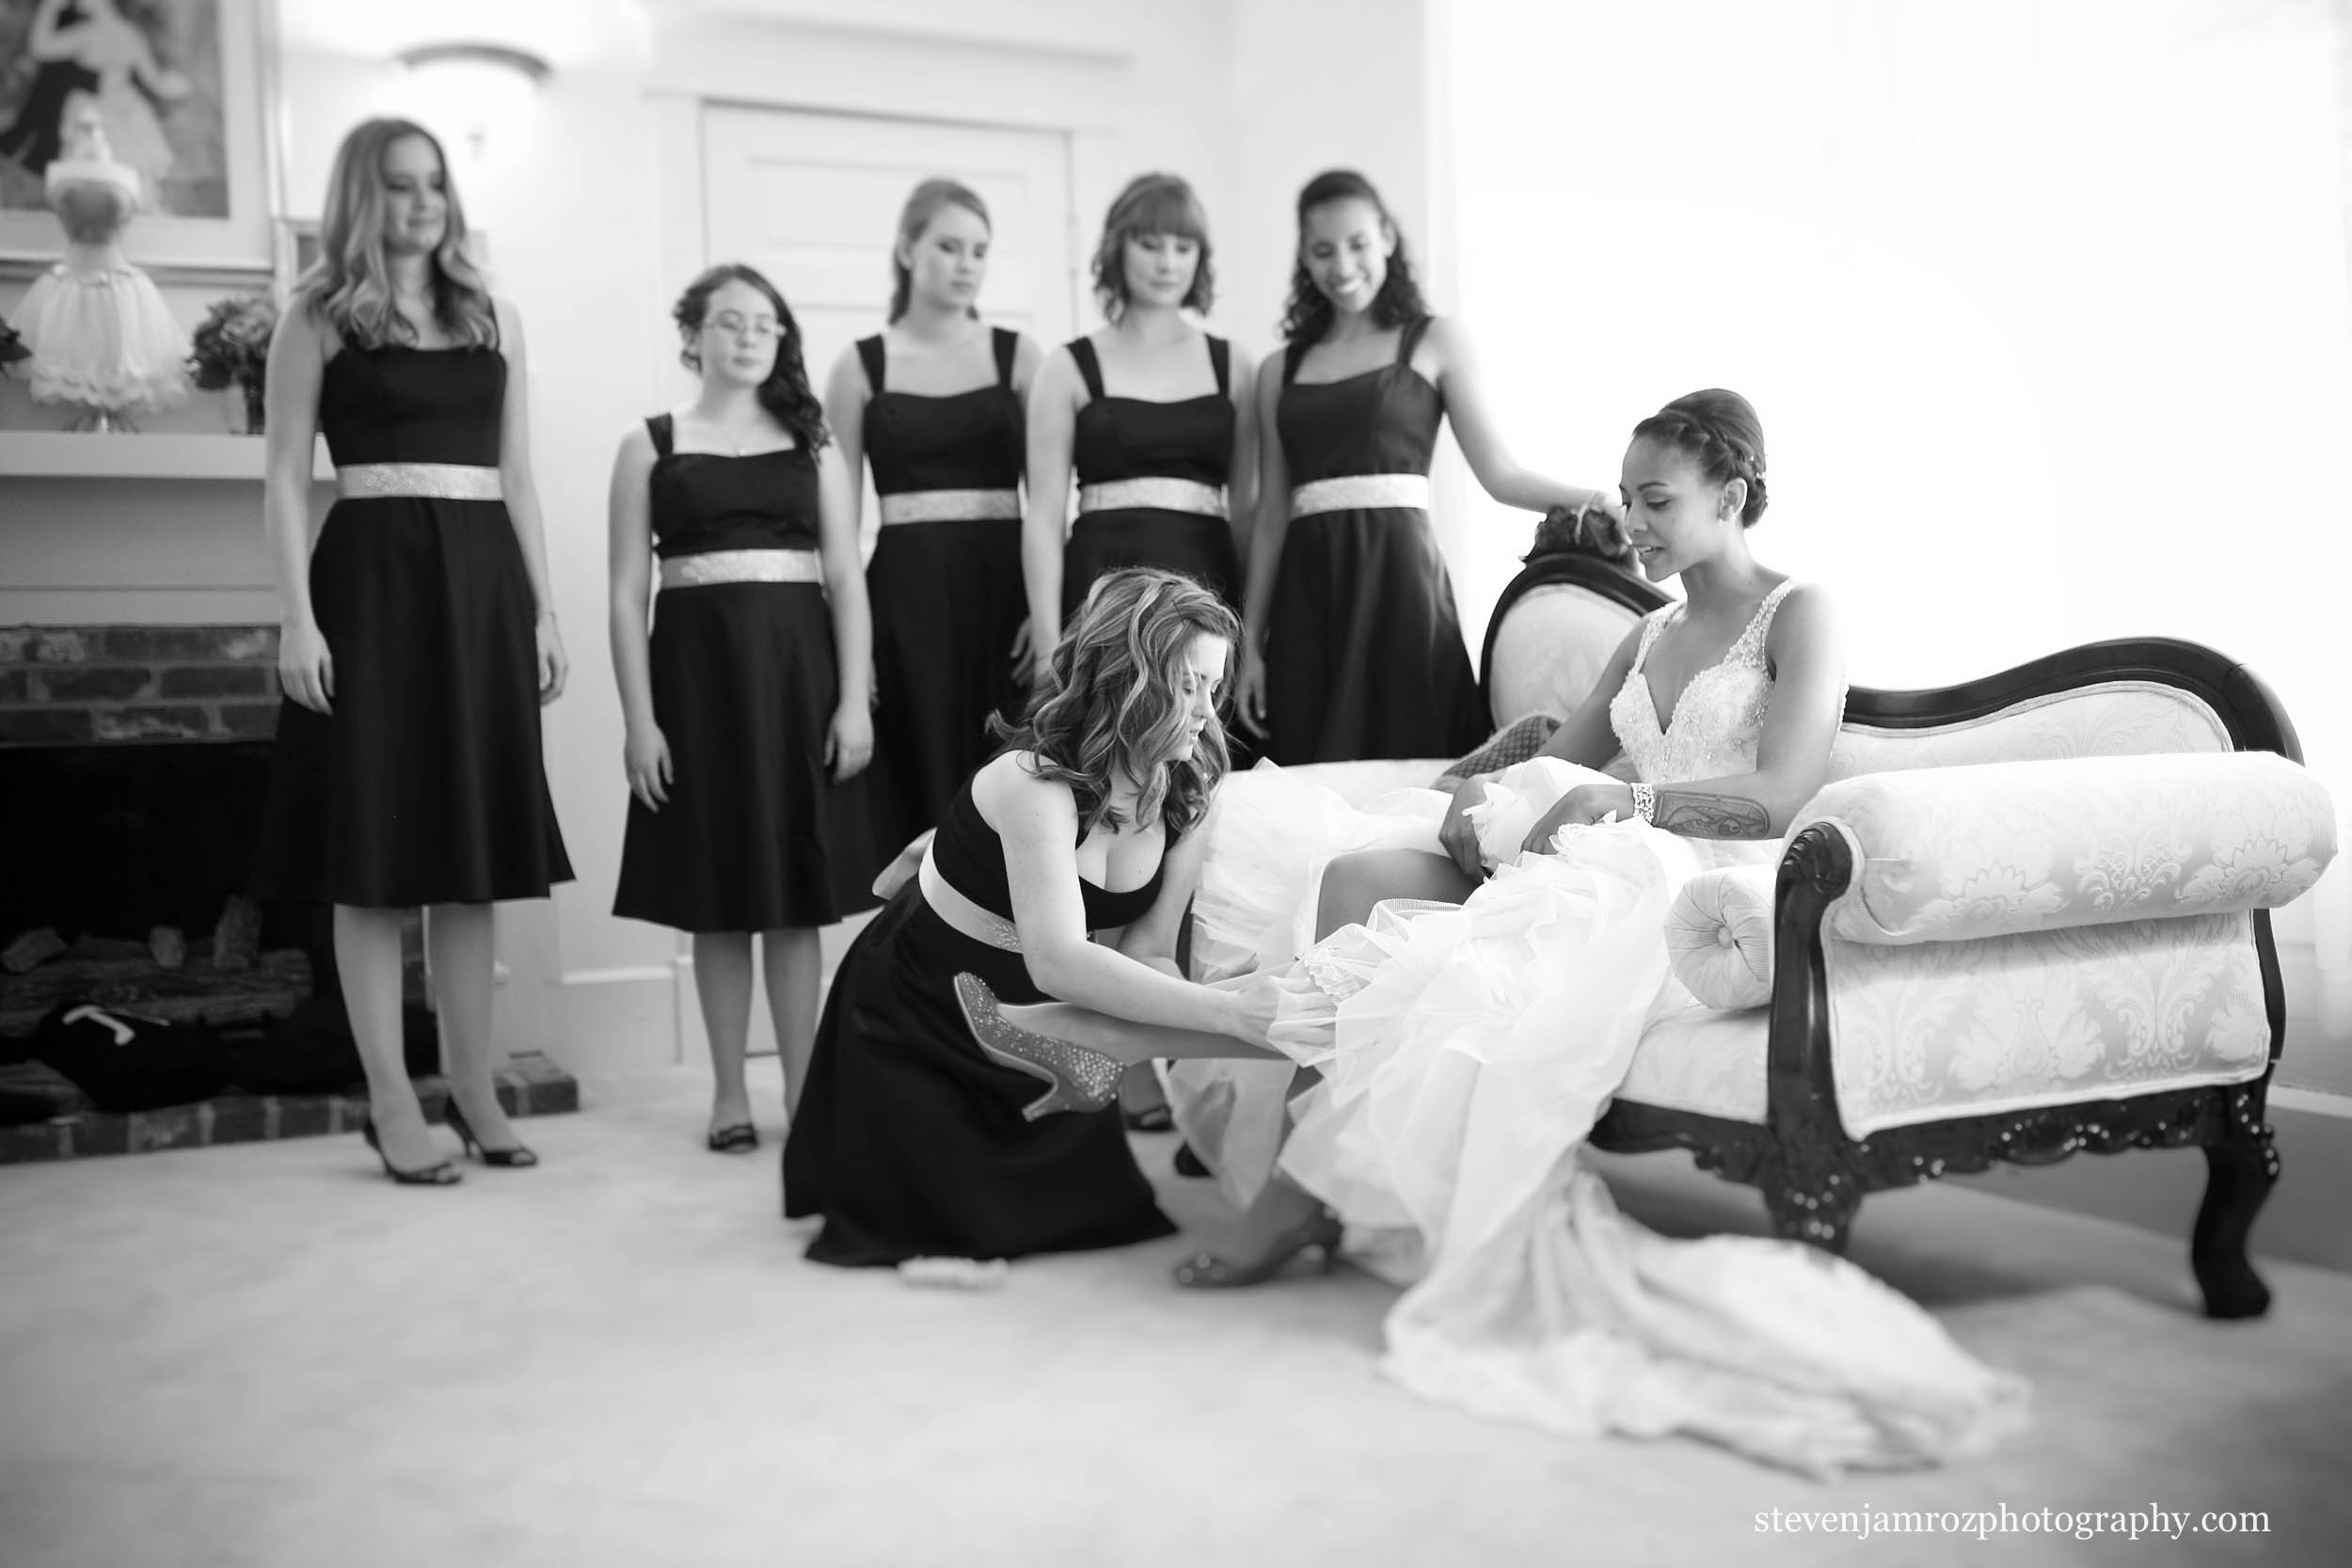 pretty-bridesmaids-and-bride-hudson-manor-steven-jamroz-photography-0260.jpg